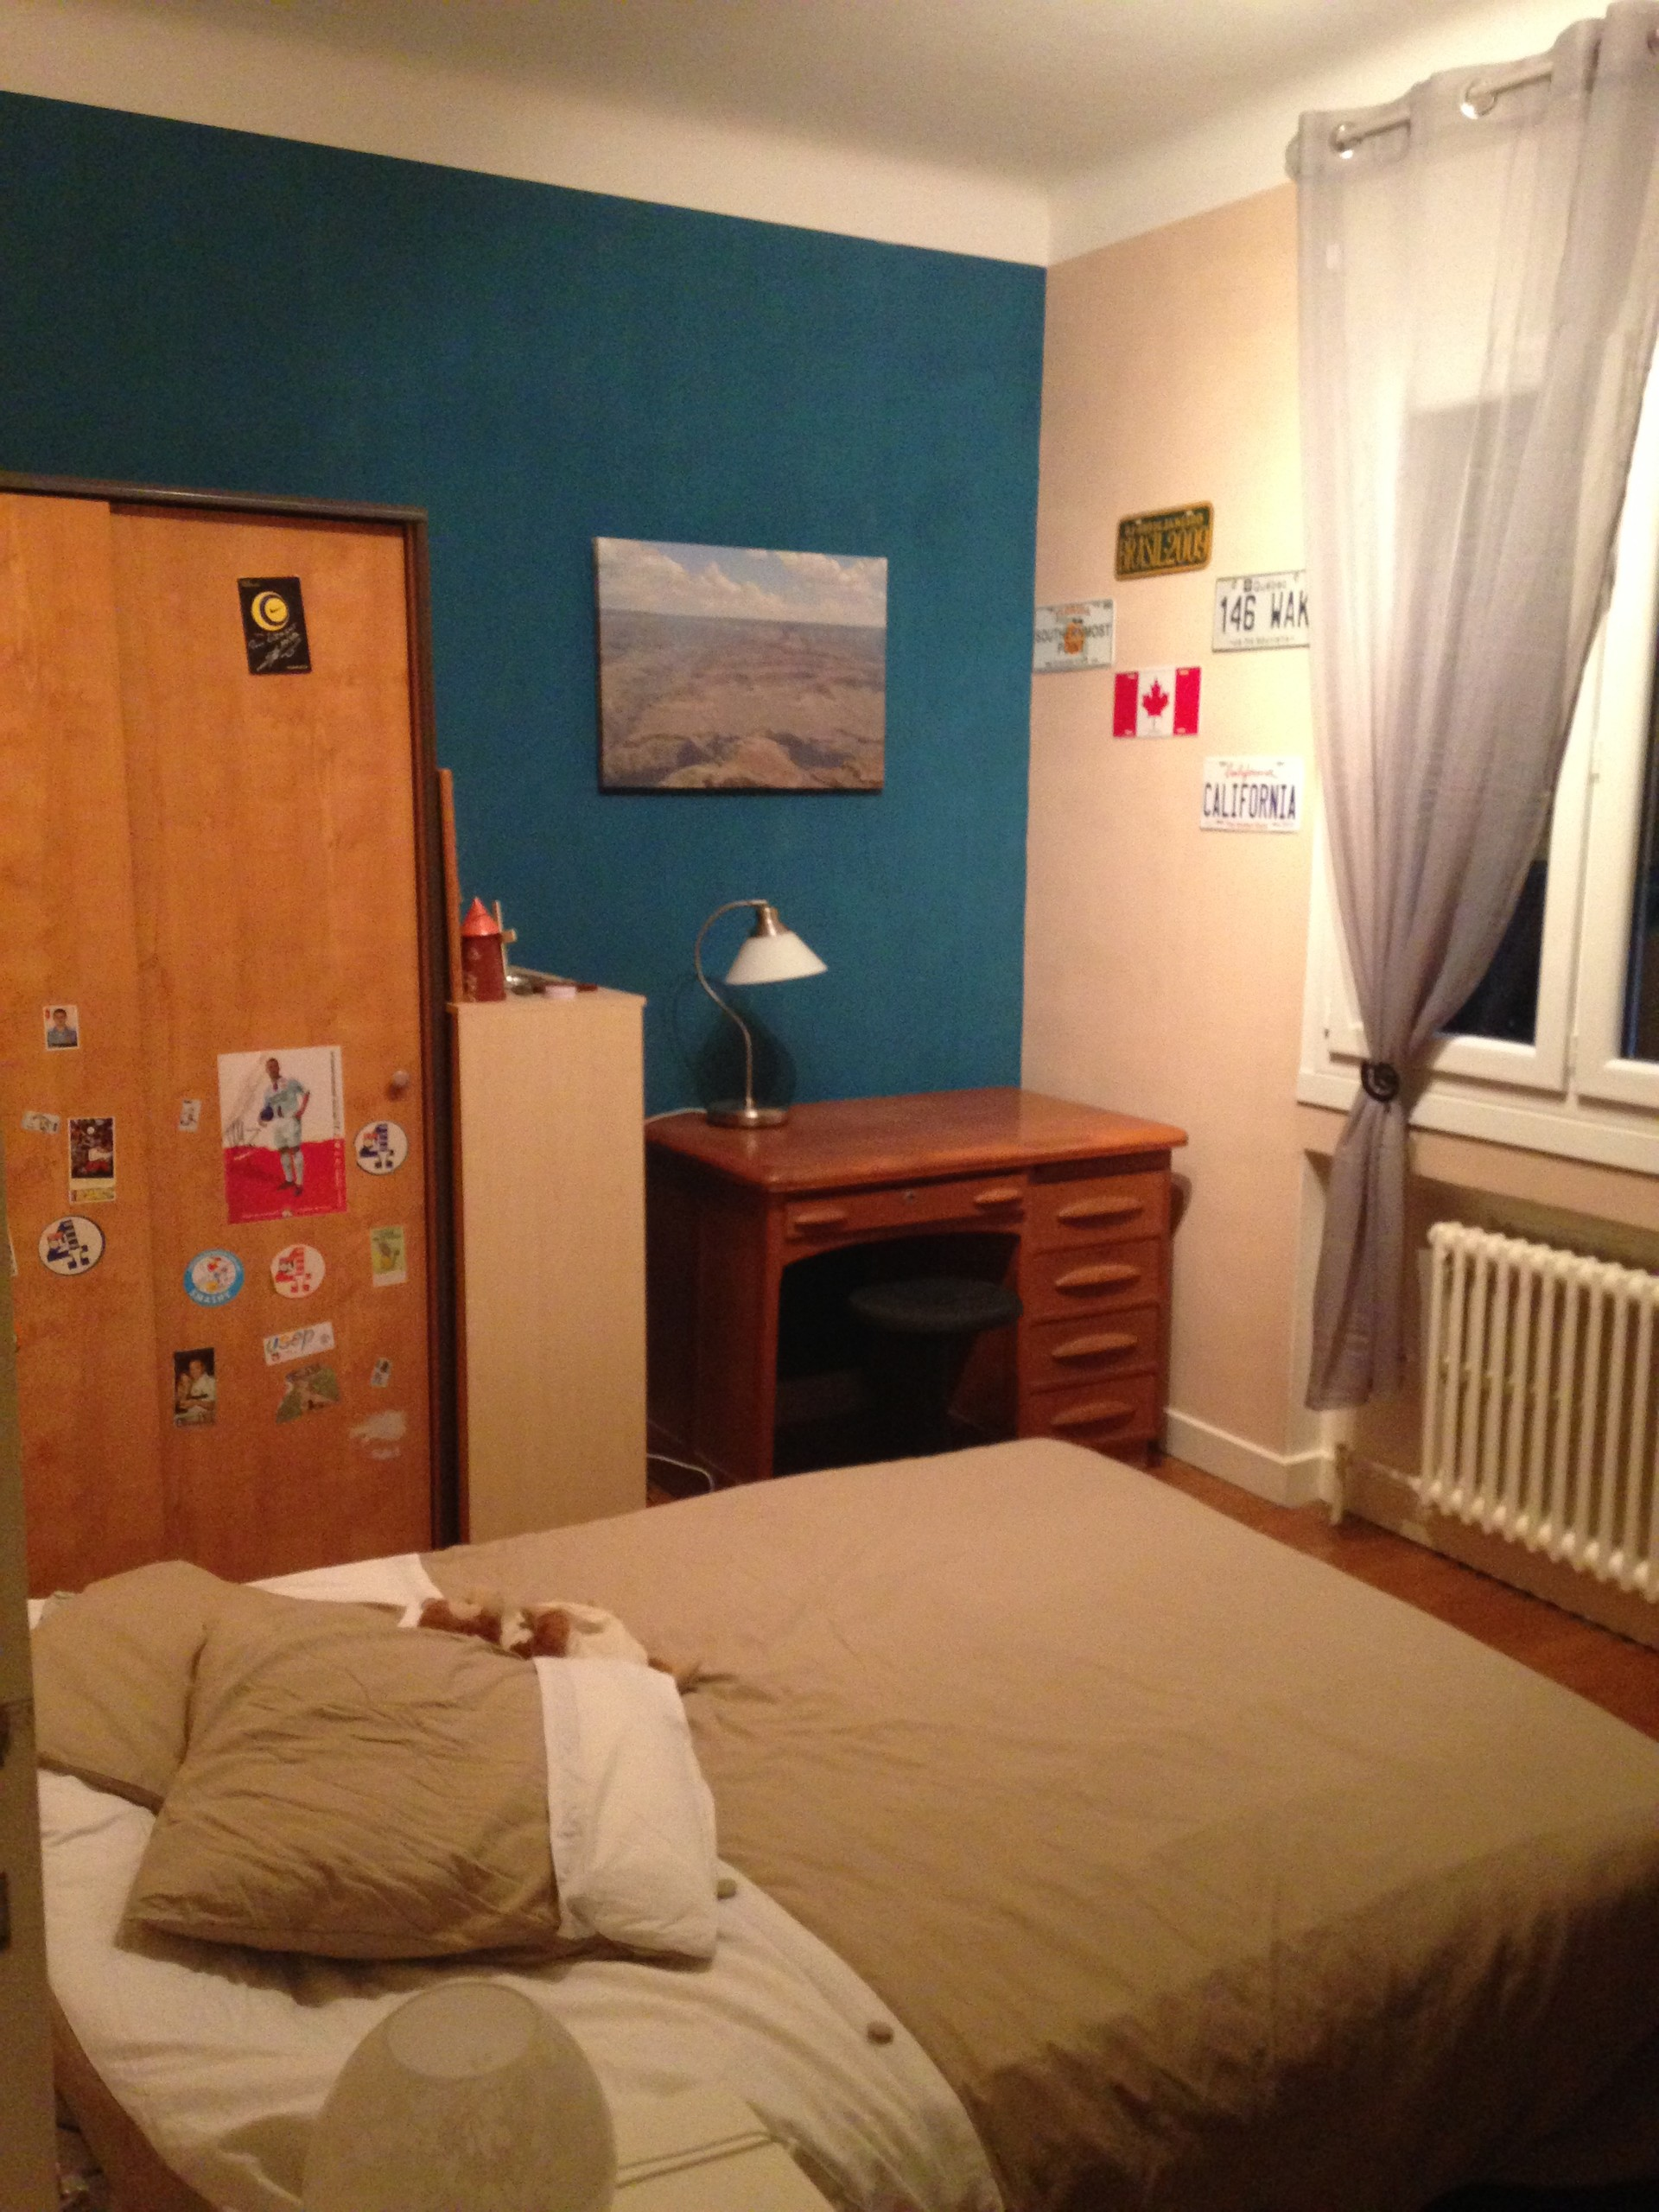 Chambre chez l 39 habitant location chambres lyon - Chambre chez l habitant nimes ...